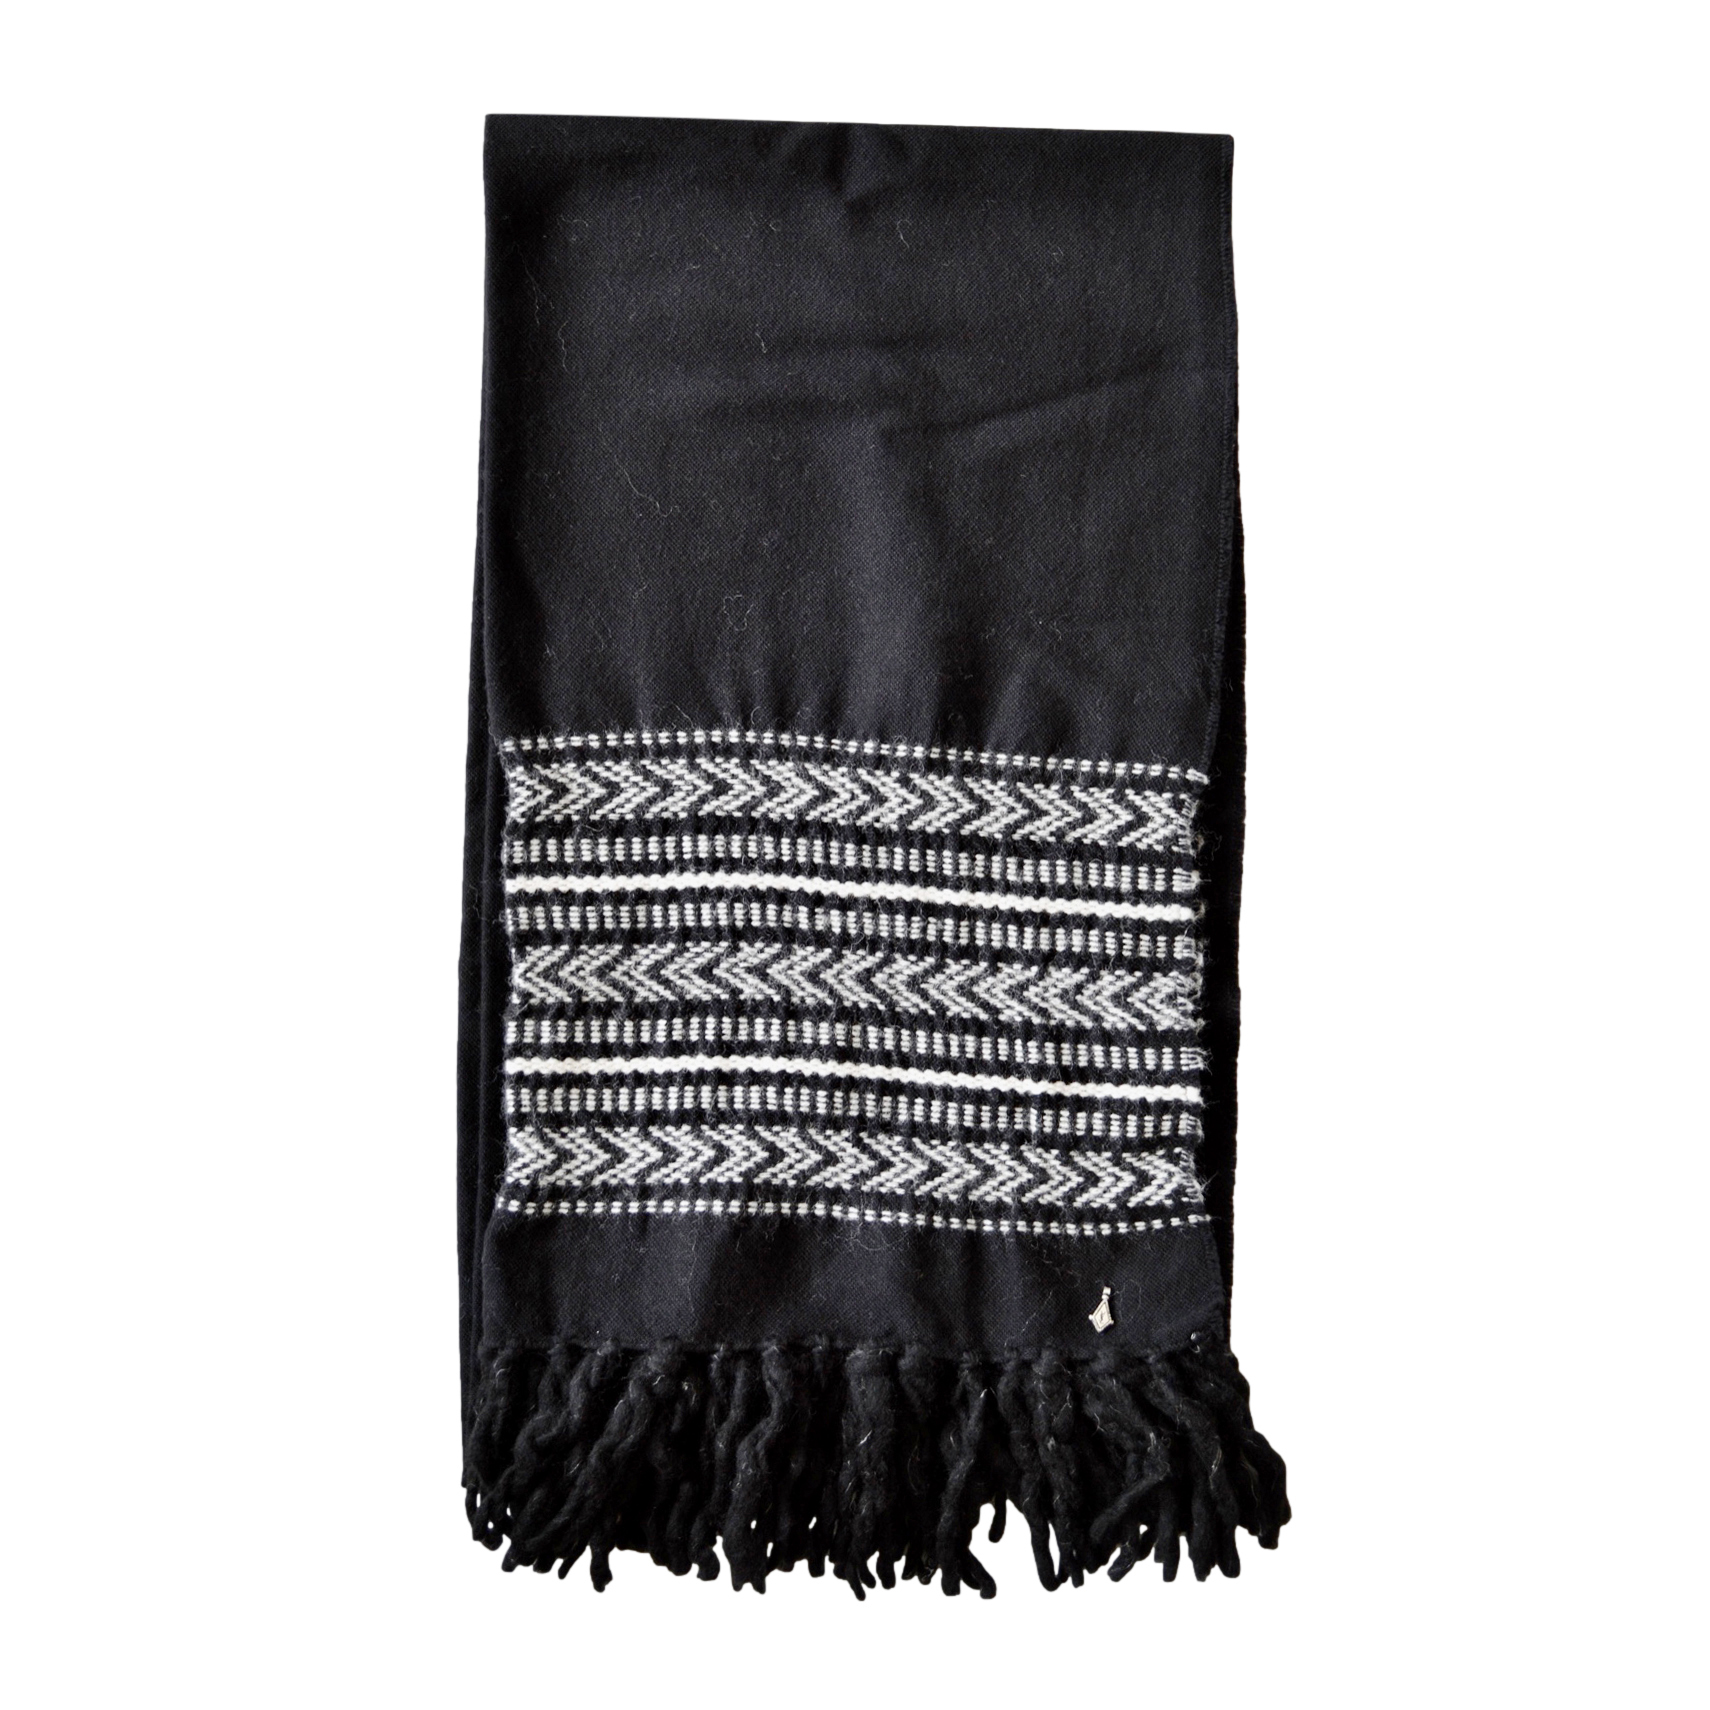 Saint Laurent Black Embroidered Wool Blend Scarf